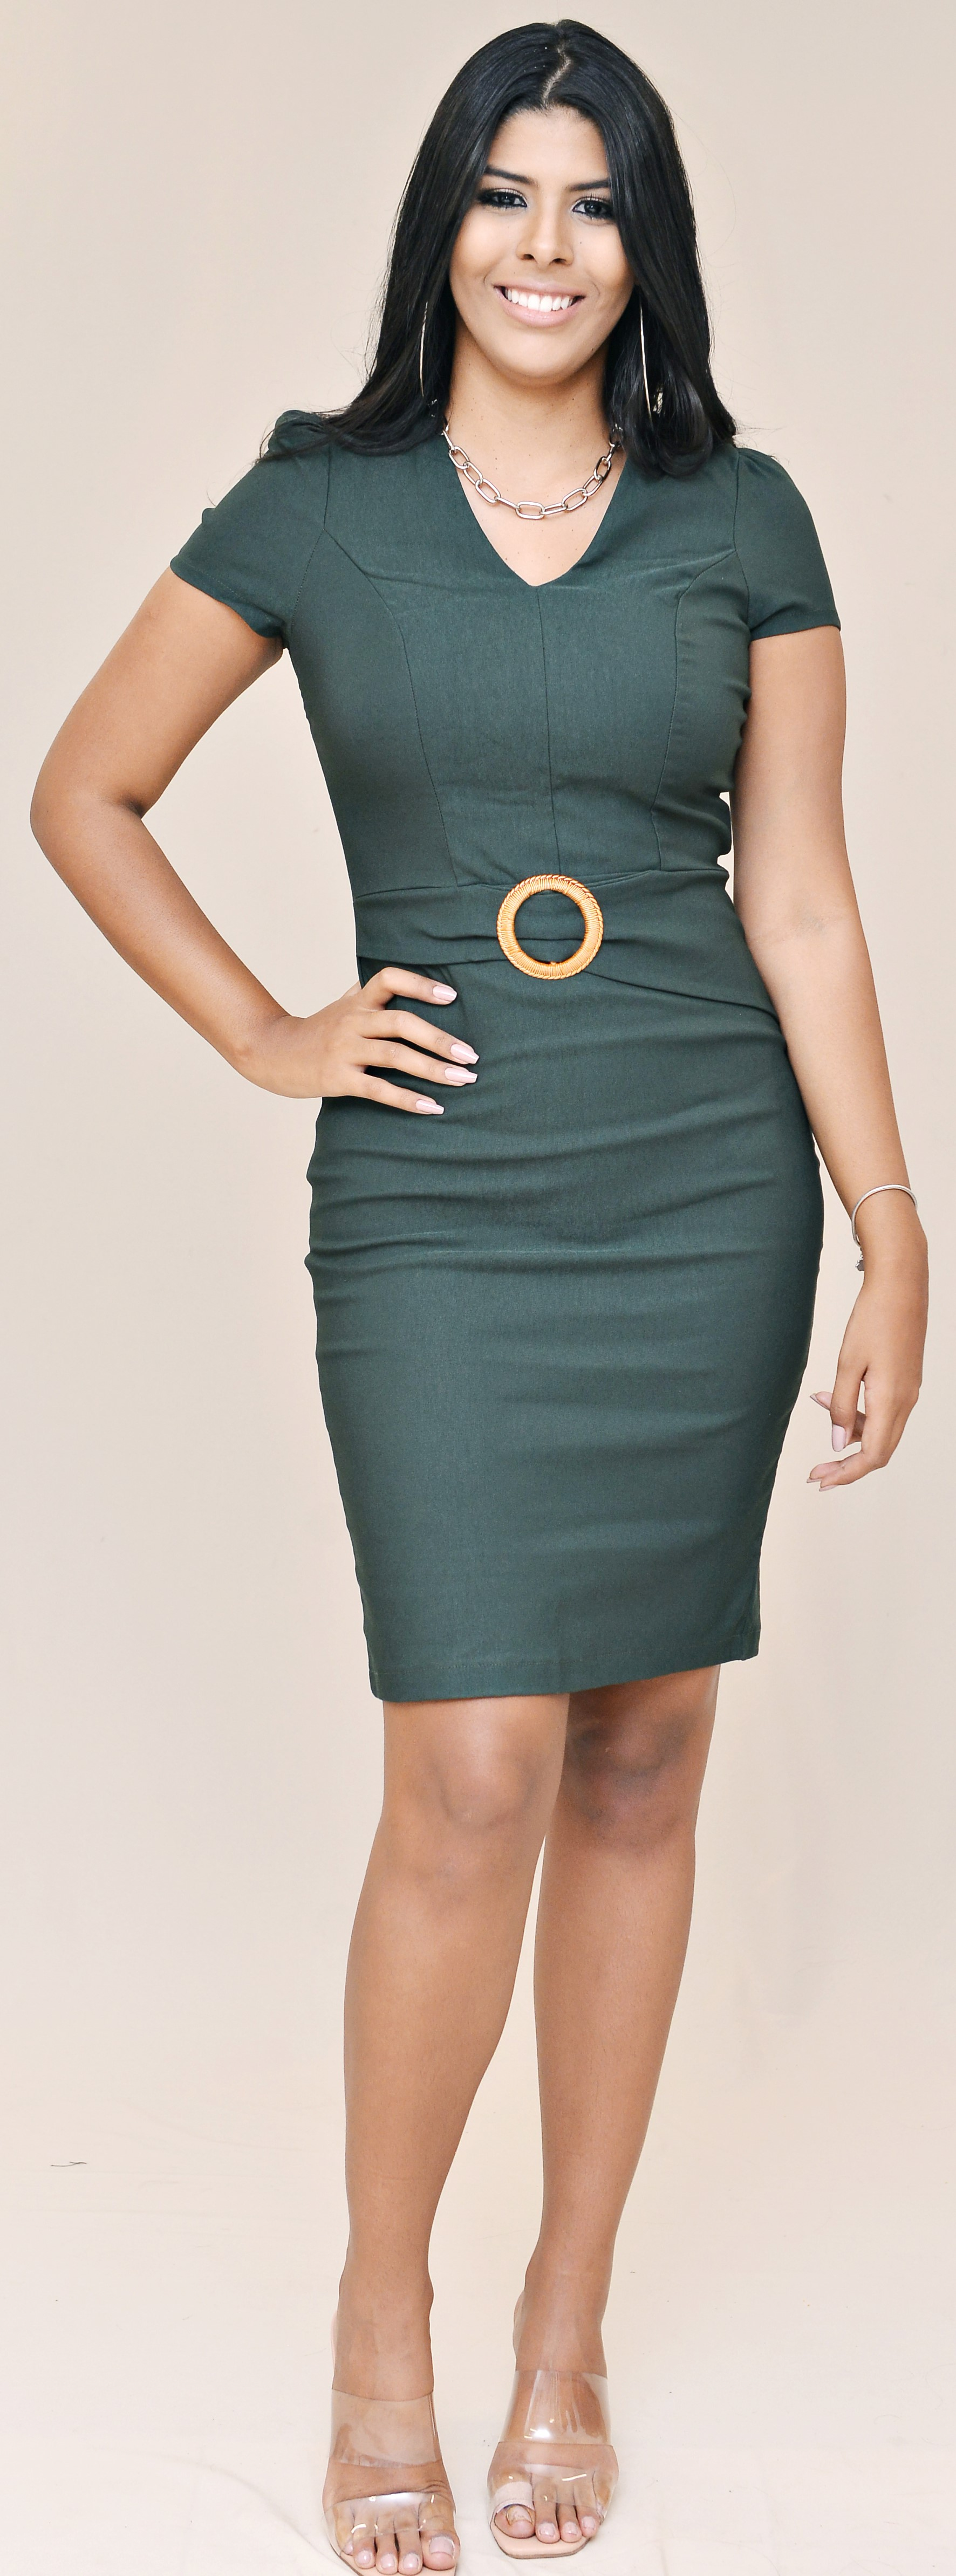 Vestido - Elegance